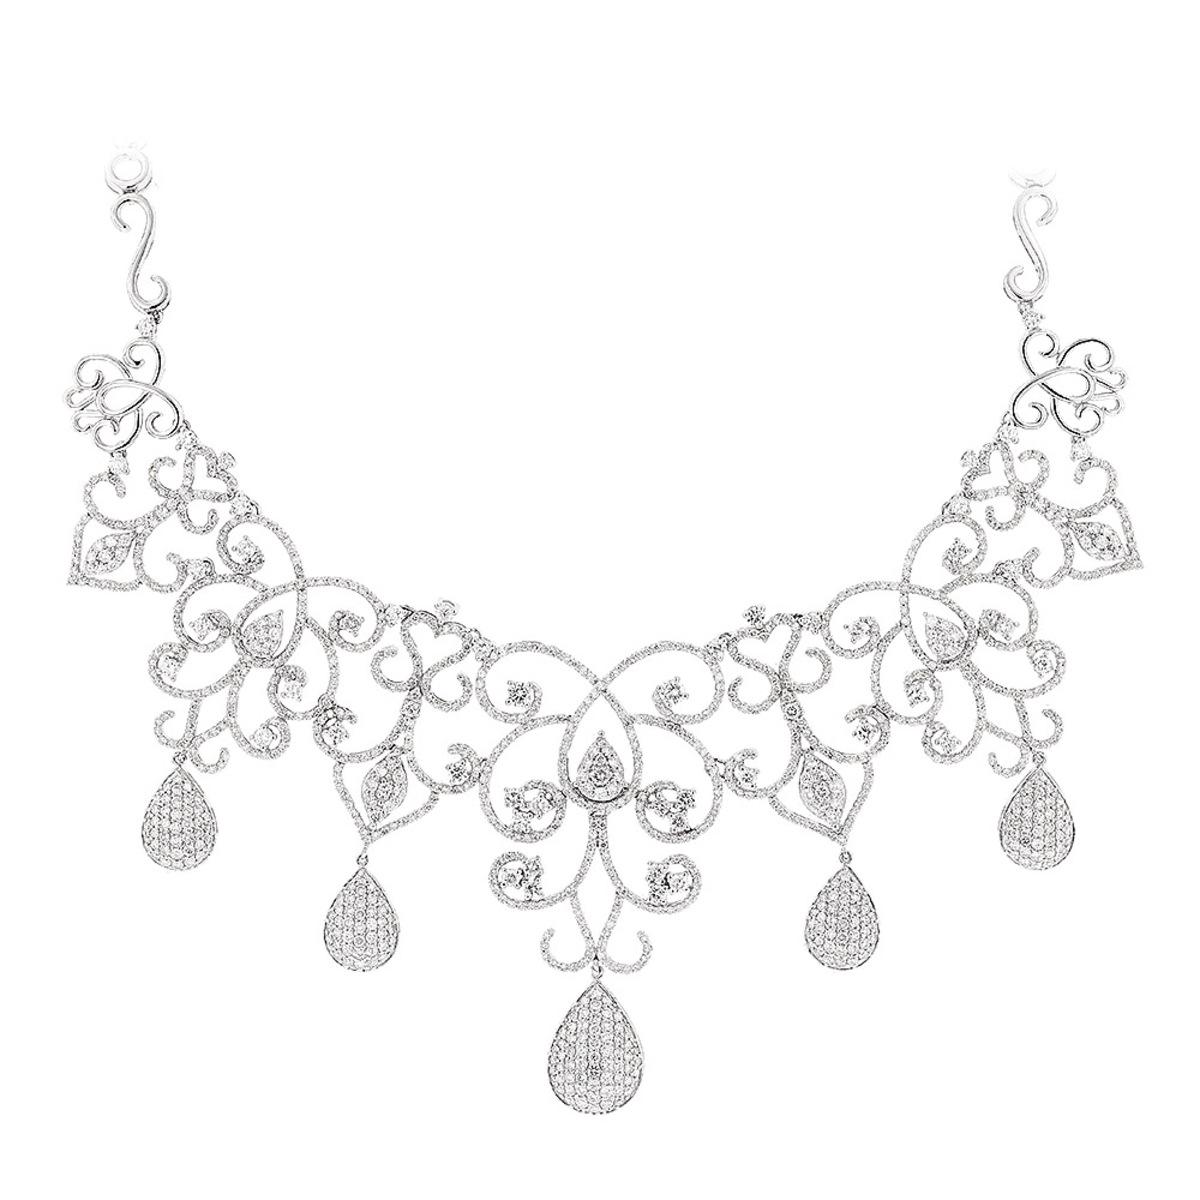 Designer Ladies Diamond Necklaces: Chandelier Necklace by Luccello 18K Gold